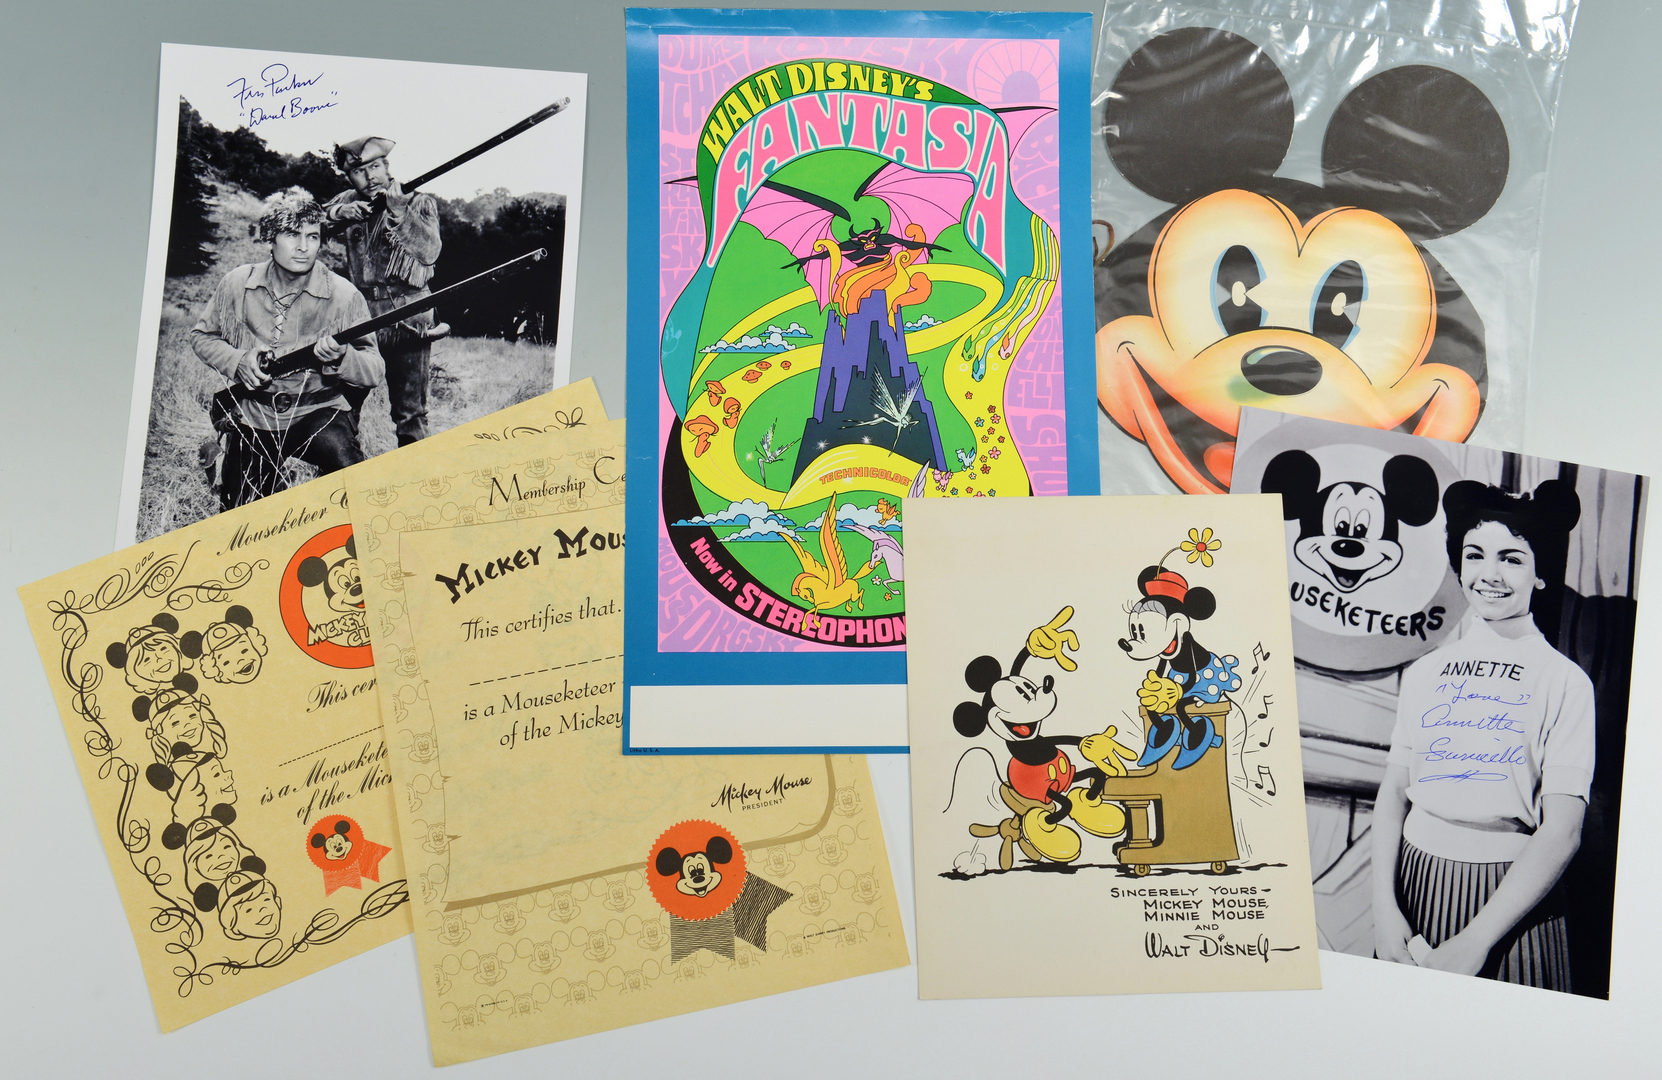 Lot 3088314: Group of Assorted Disney Memorabilia